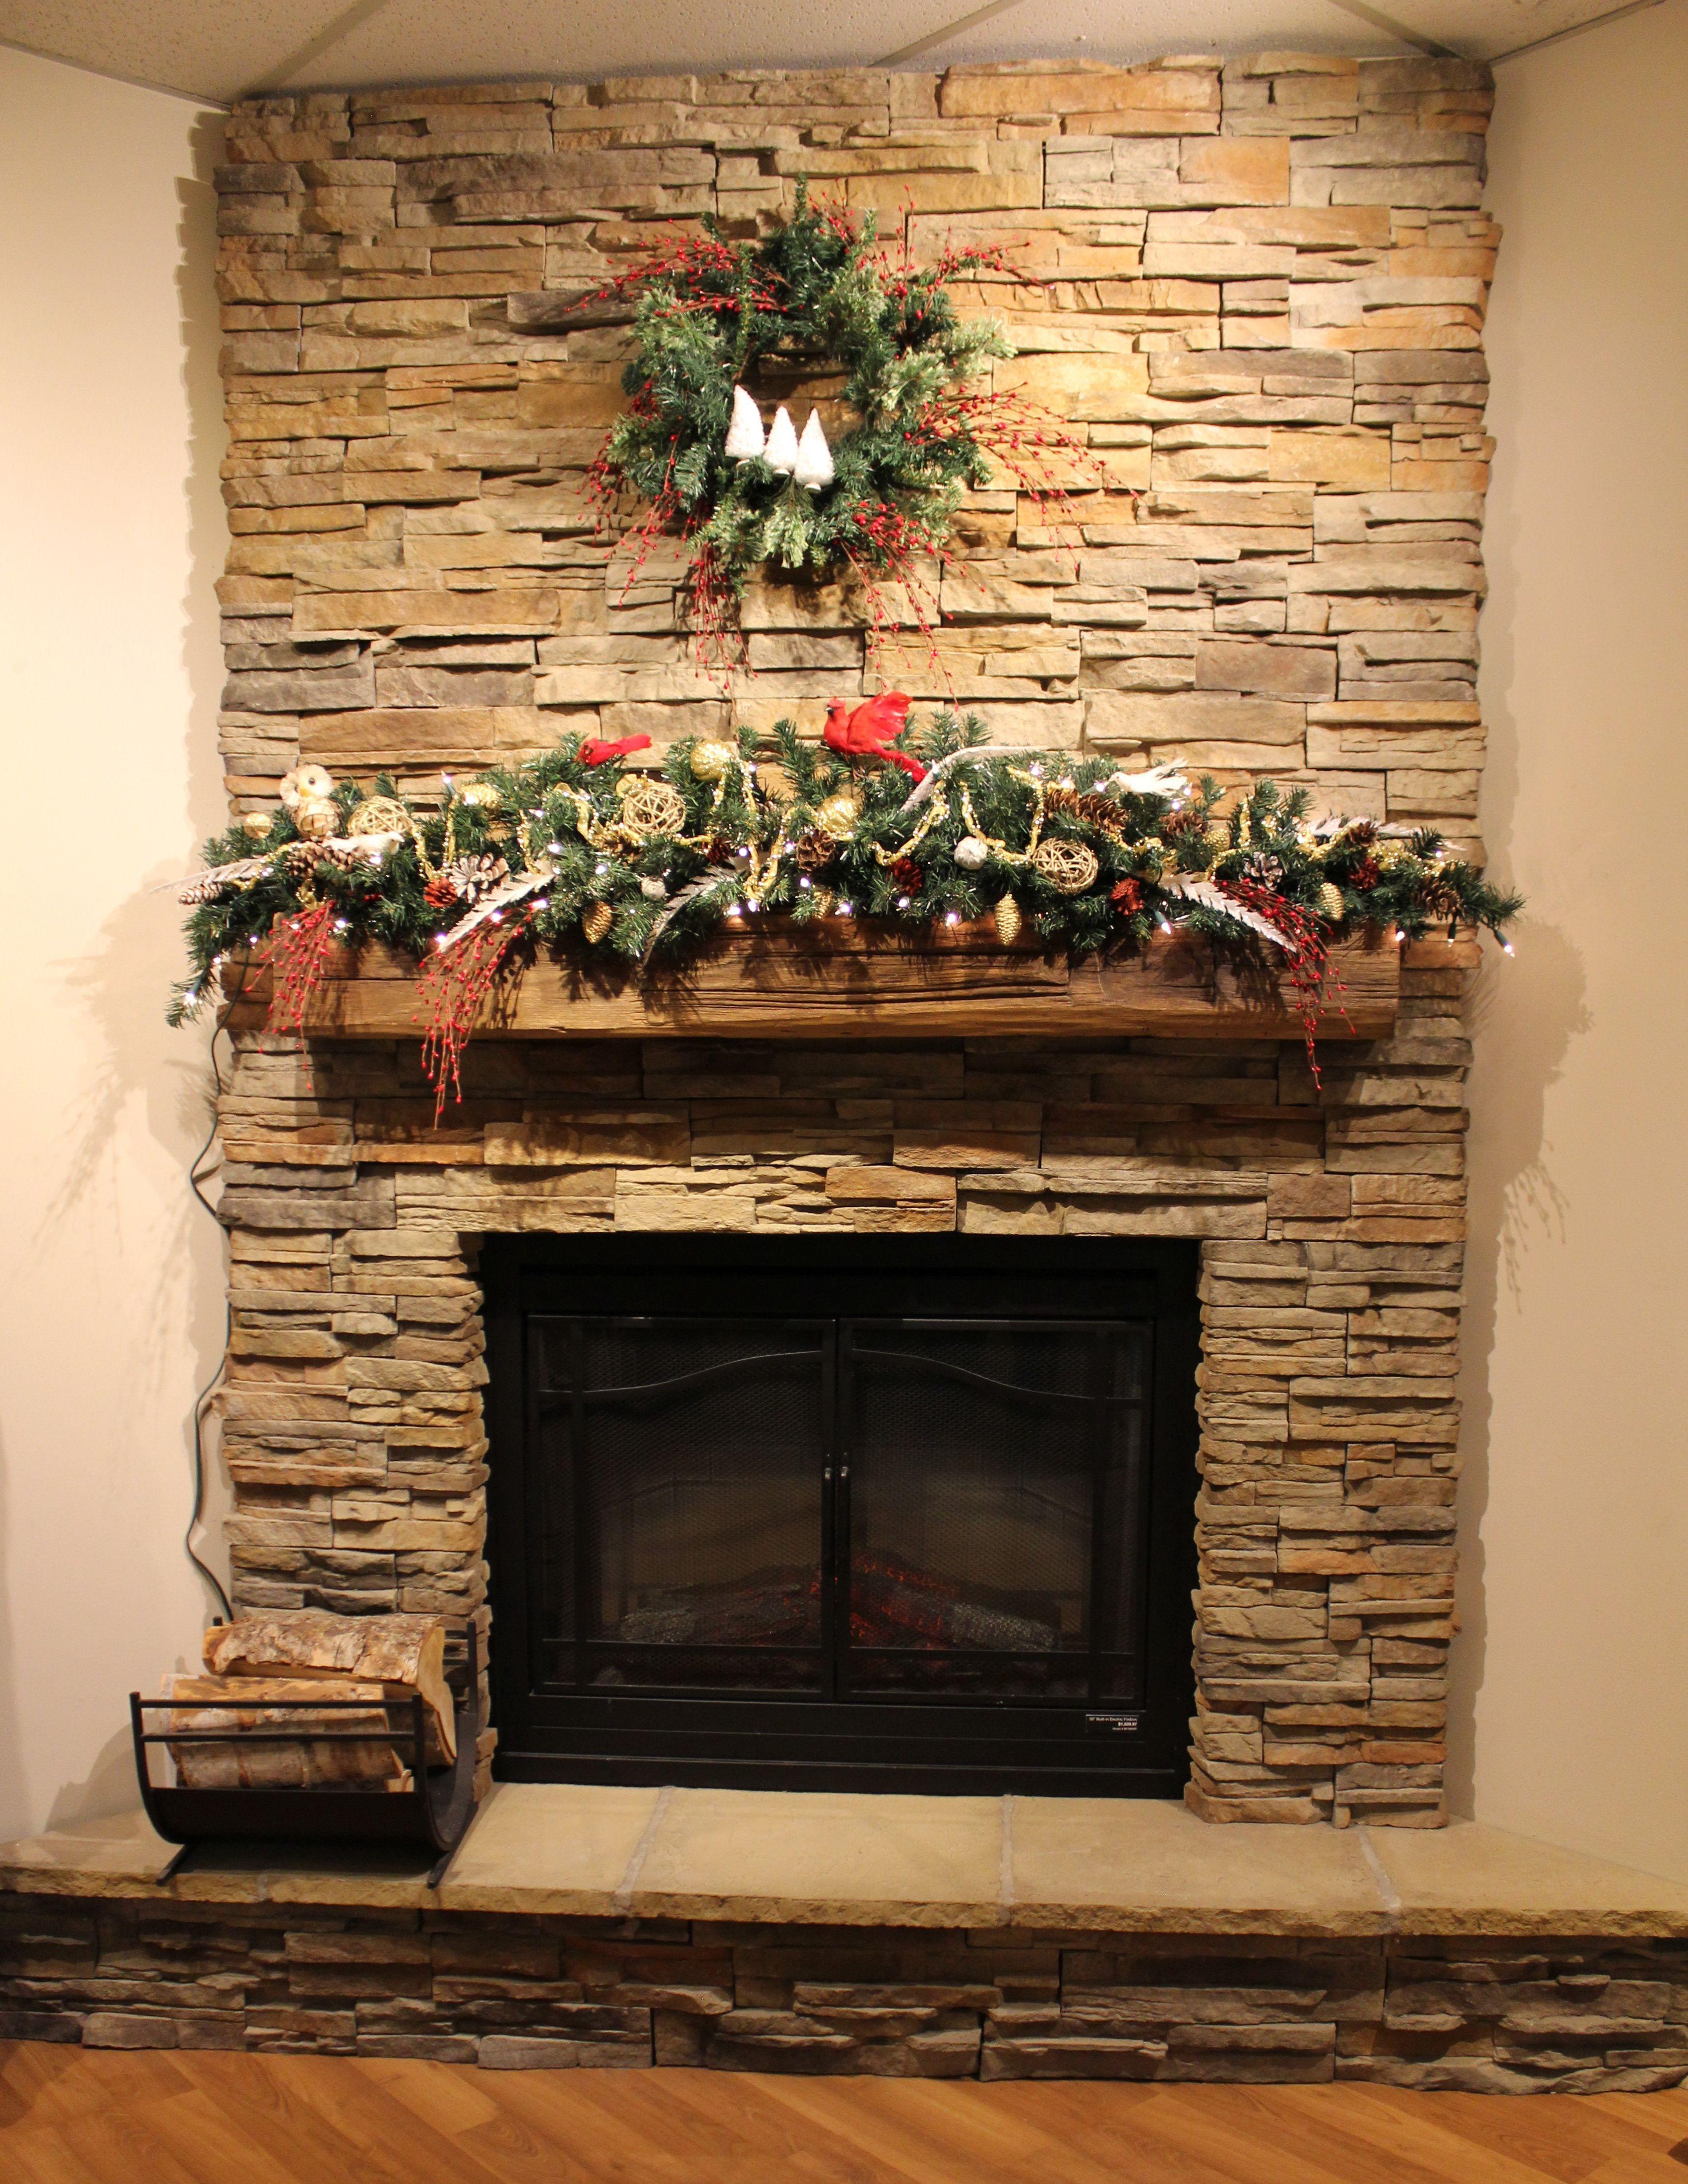 Holiday Mantel Decorating with Stone Selex - Timber Ledge Stone ...